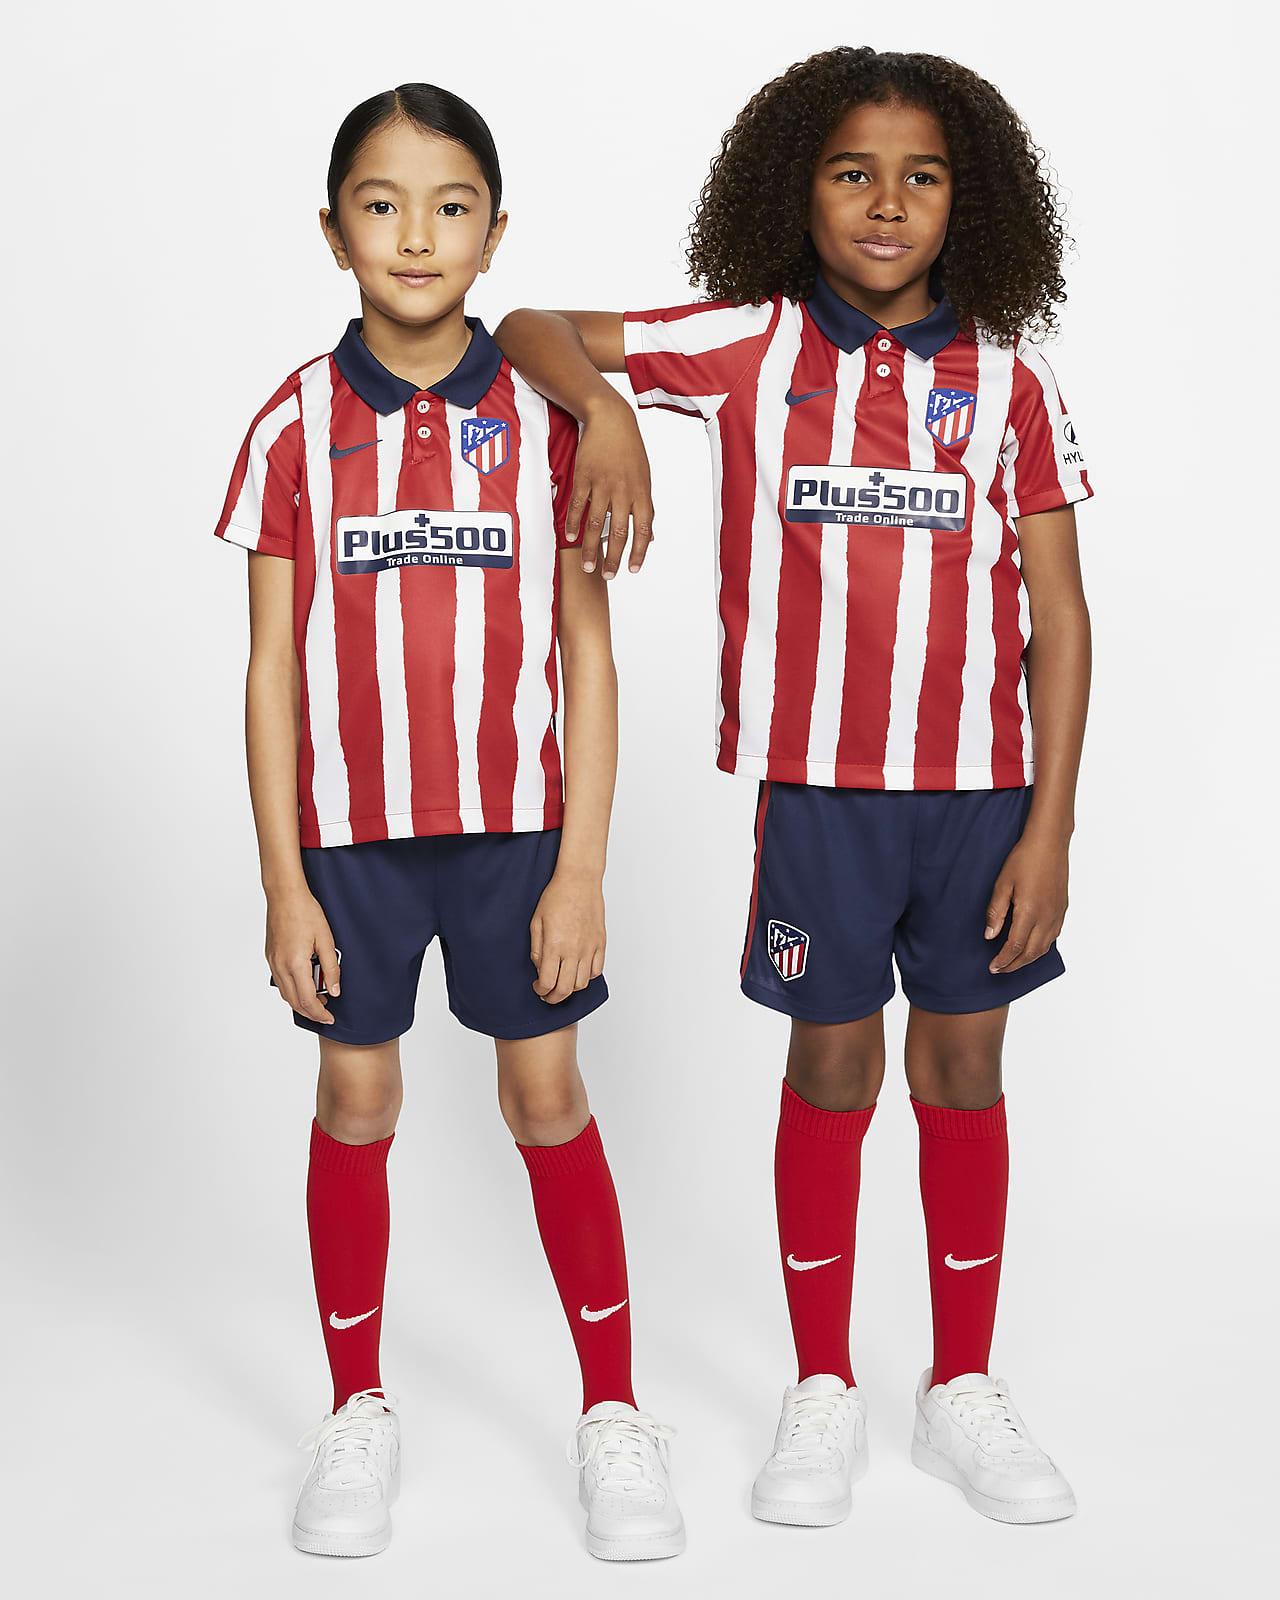 Atlético de Madrid 2020/21 İç Saha Küçük Çocuk Futbol Forması